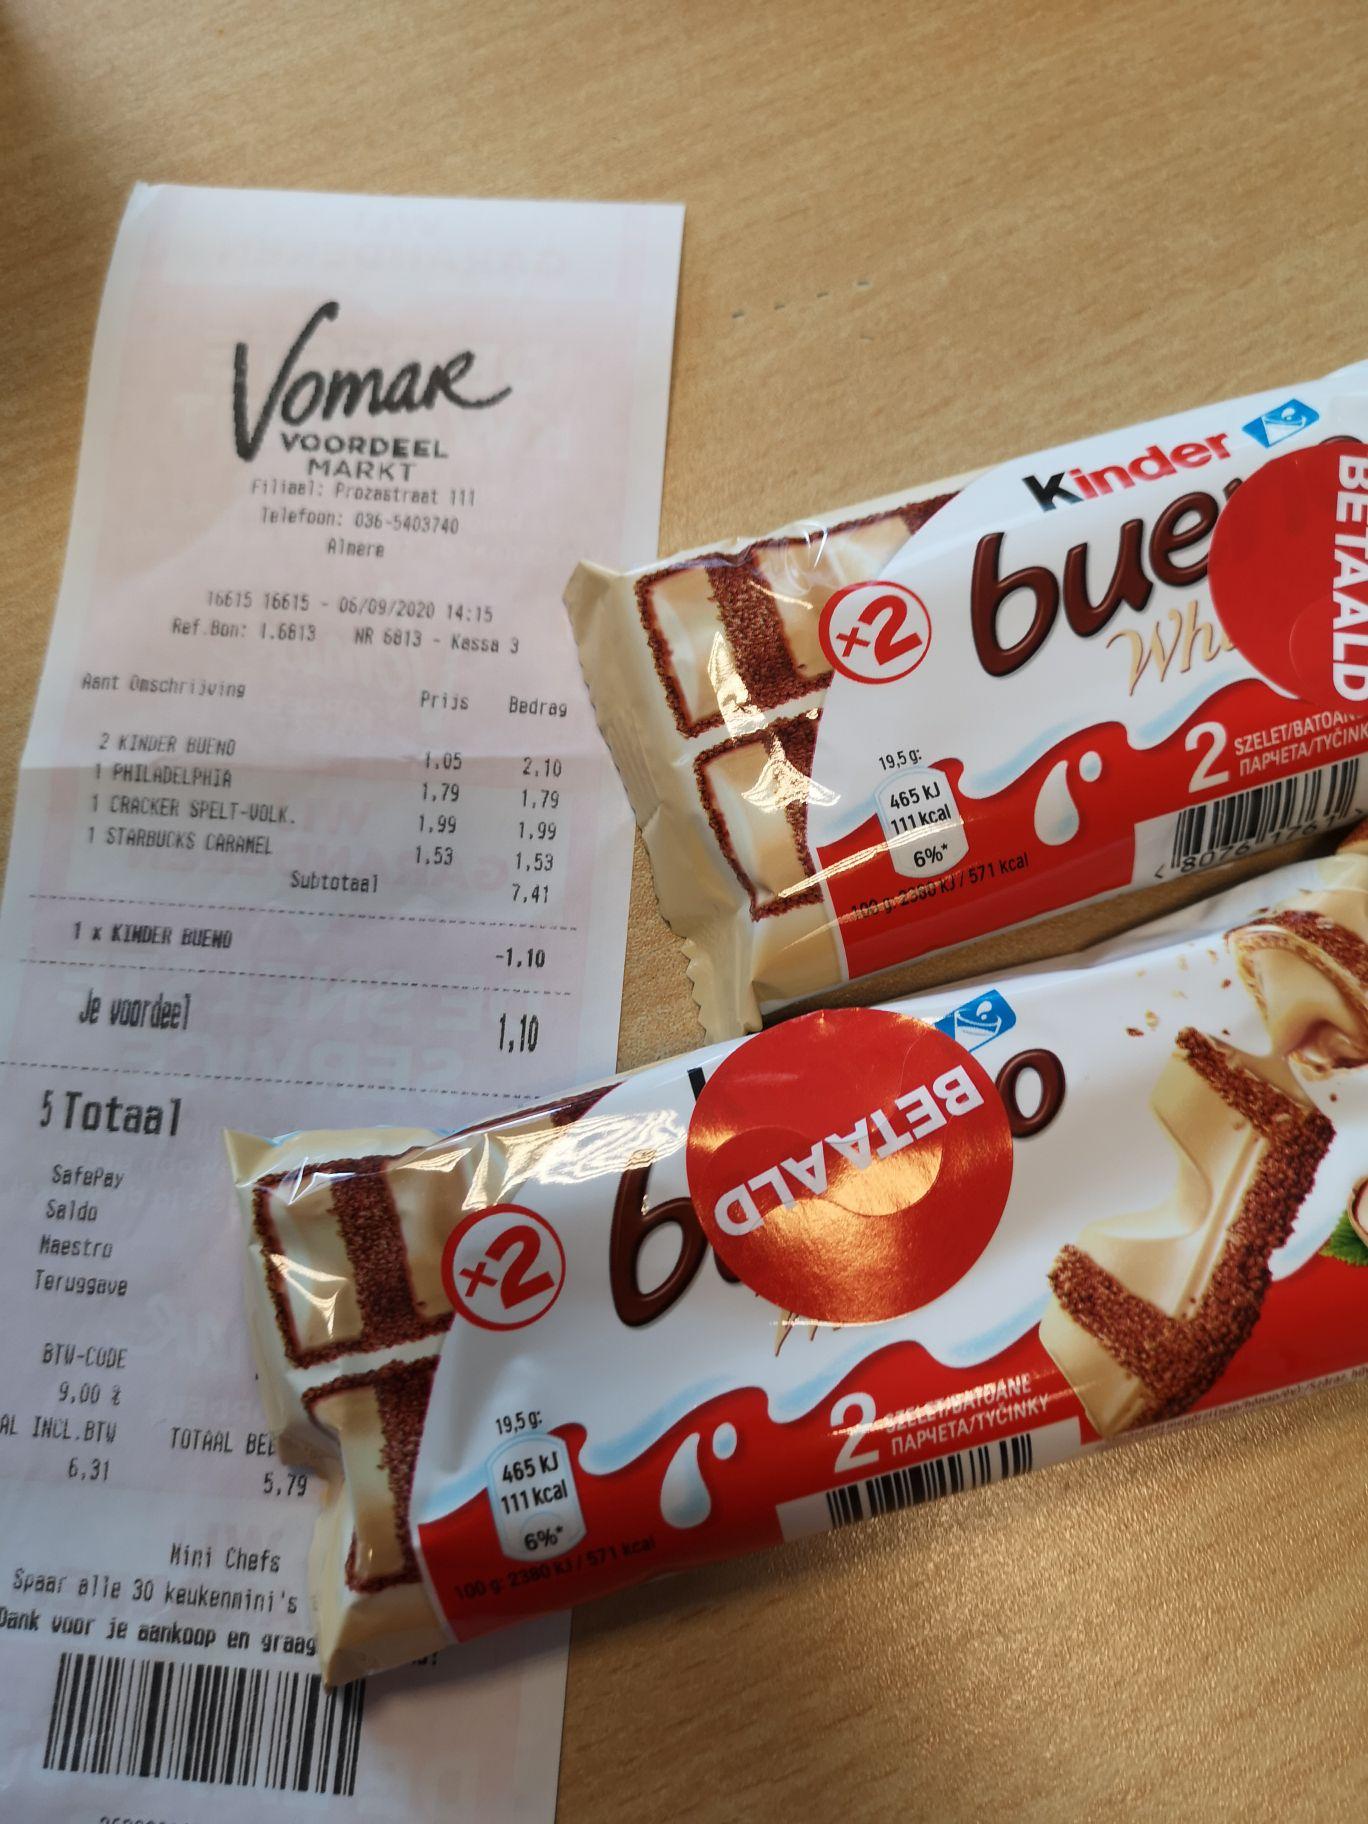 2 Kinder Bueno's voor 1 euro! @Vomar Litratuurwijk Almere